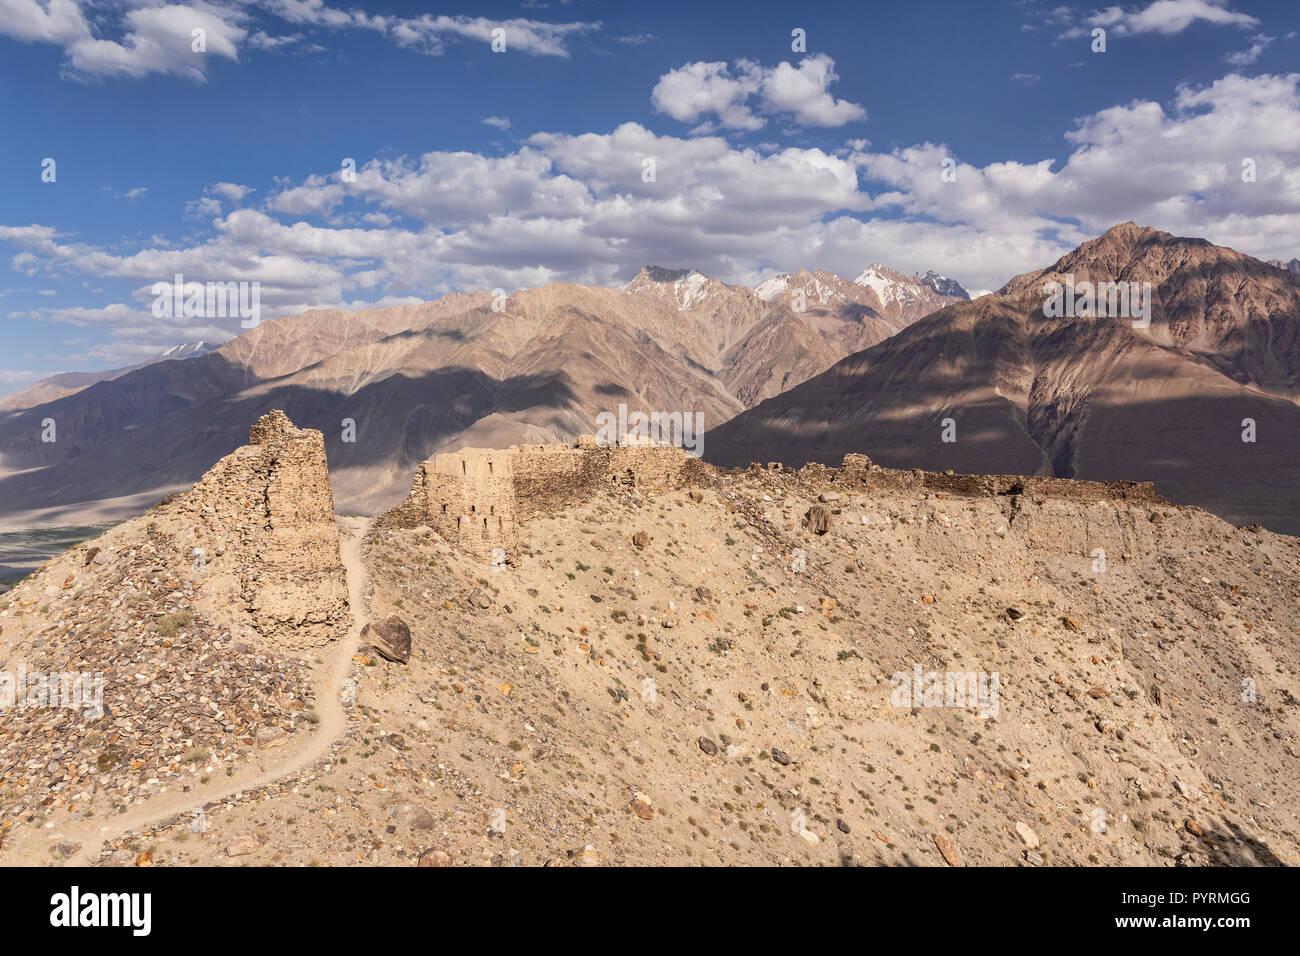 Yamchun fortress in golden light with views of Panj River and Hindu Kush, Yamchun, Wakhan Valley, Tajikistan - Stock Image